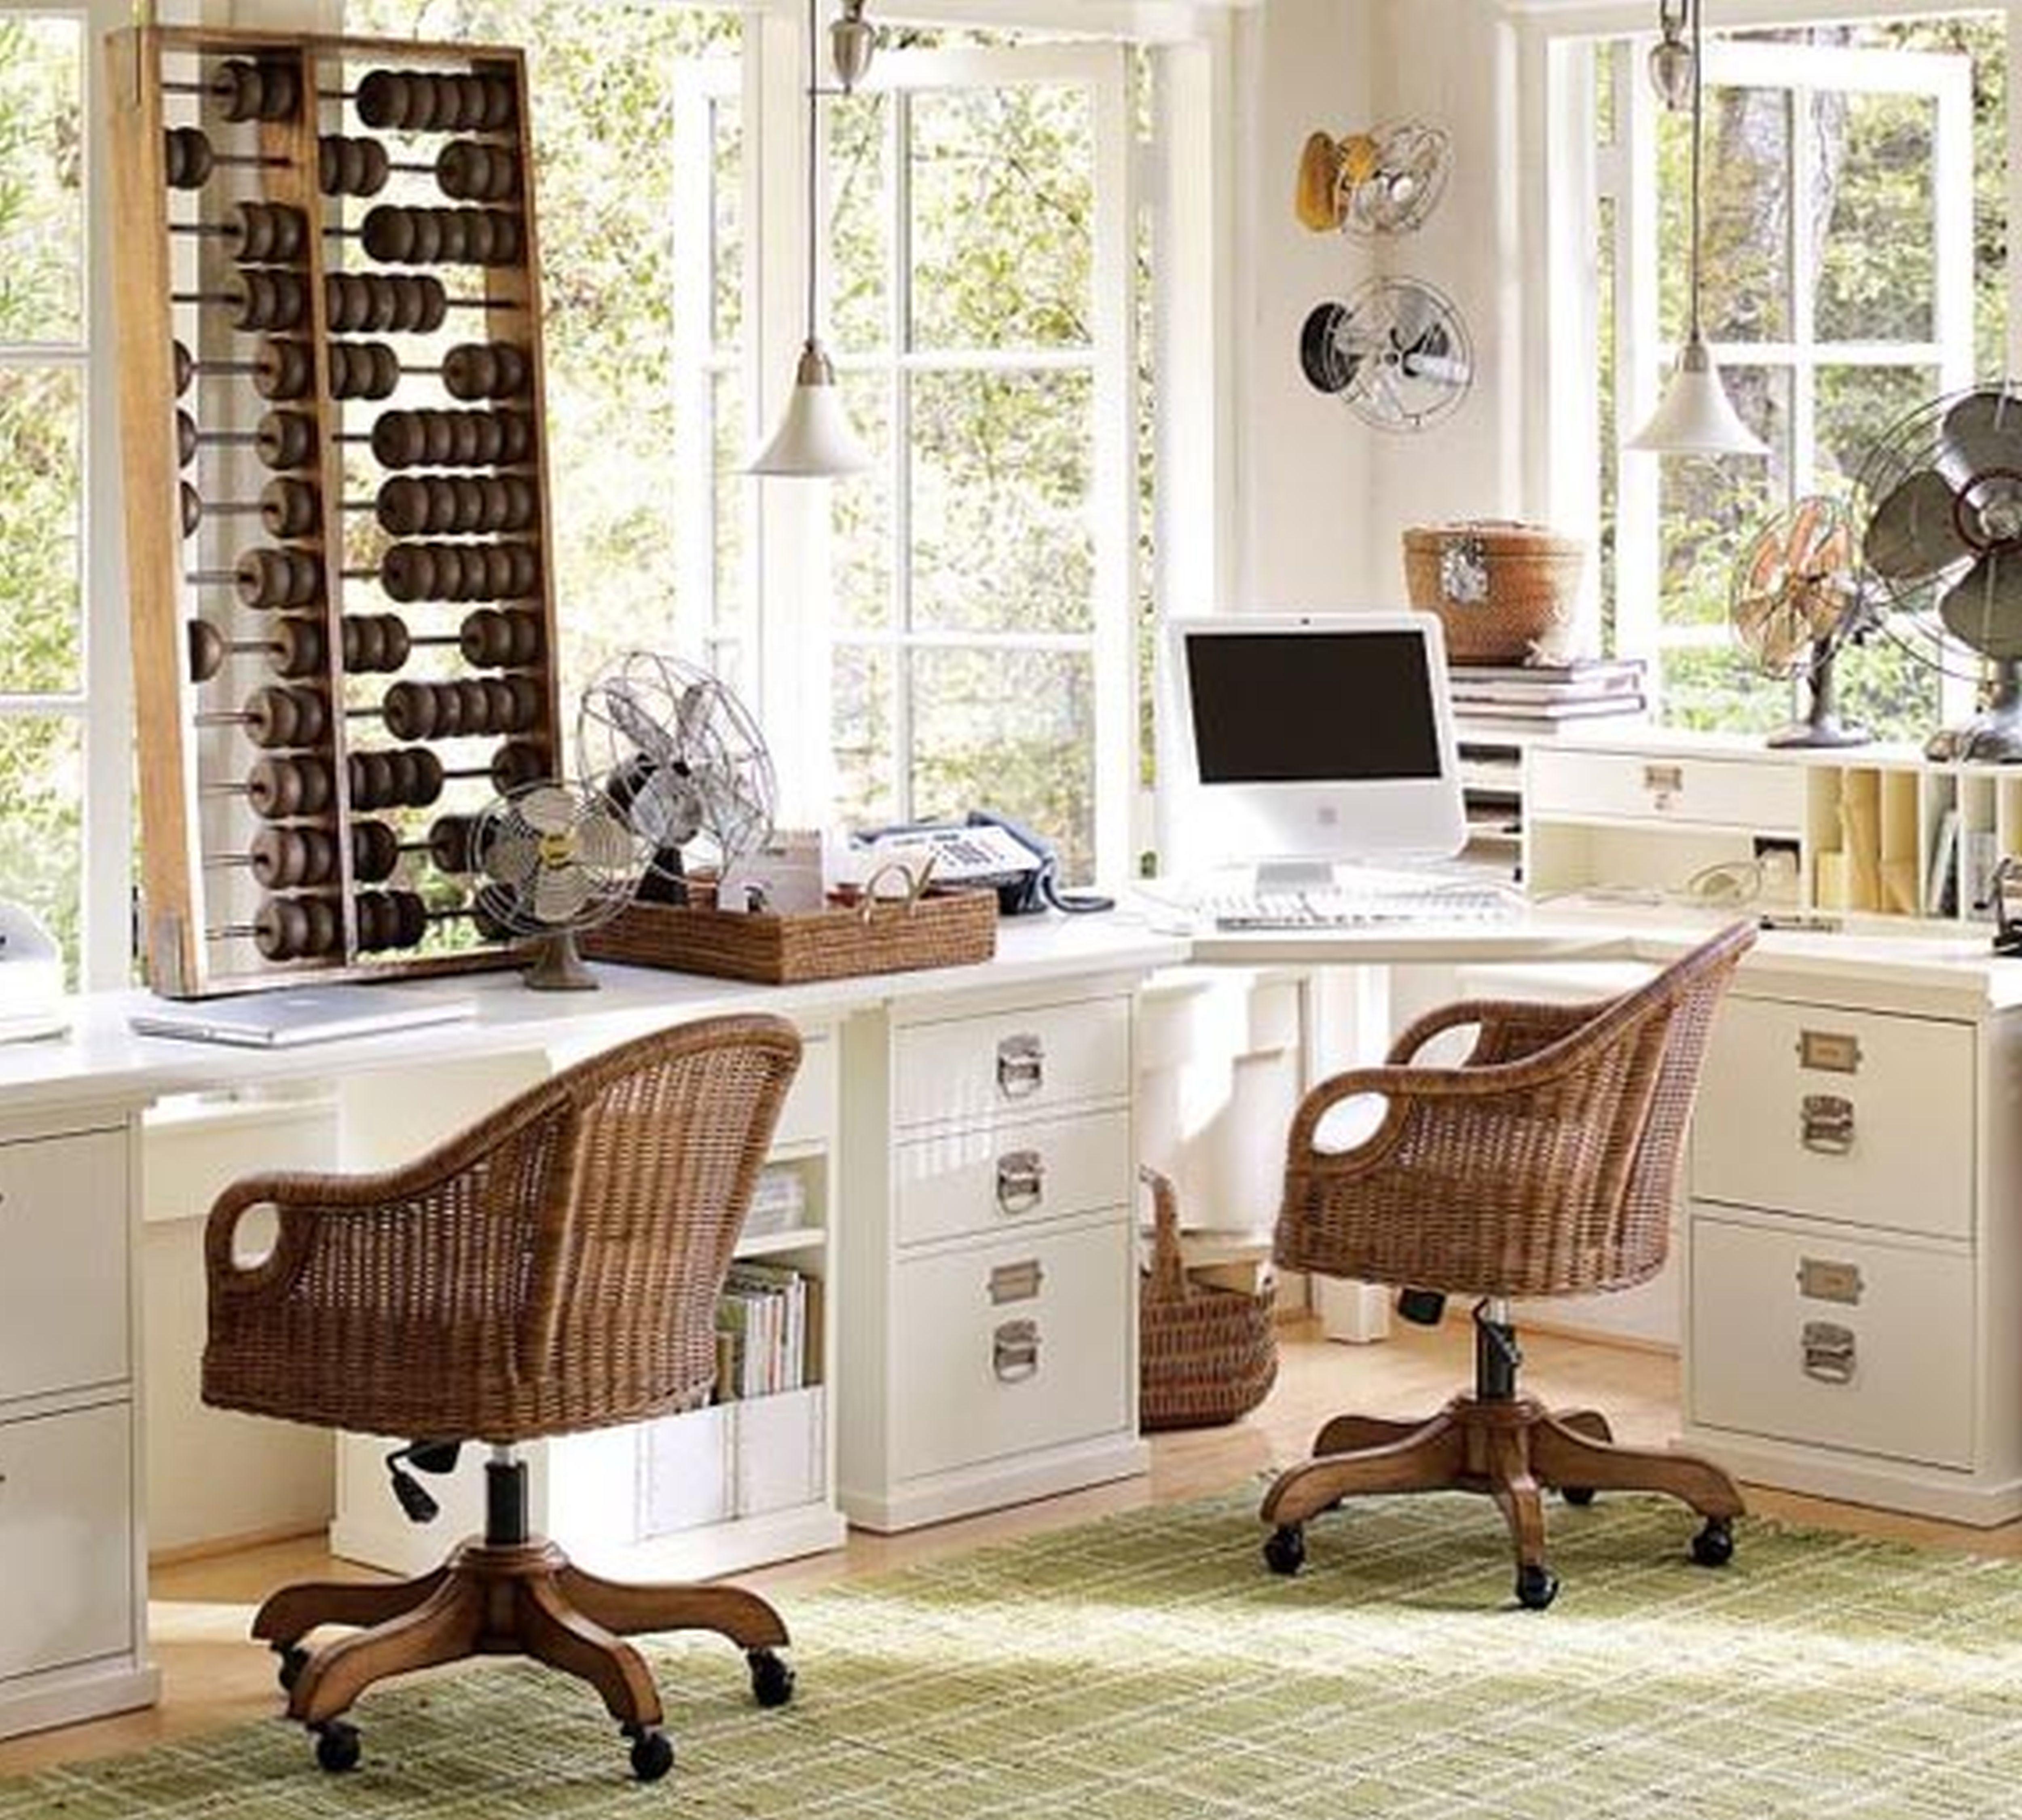 Home Office Floor Plan Ideas - Google Search